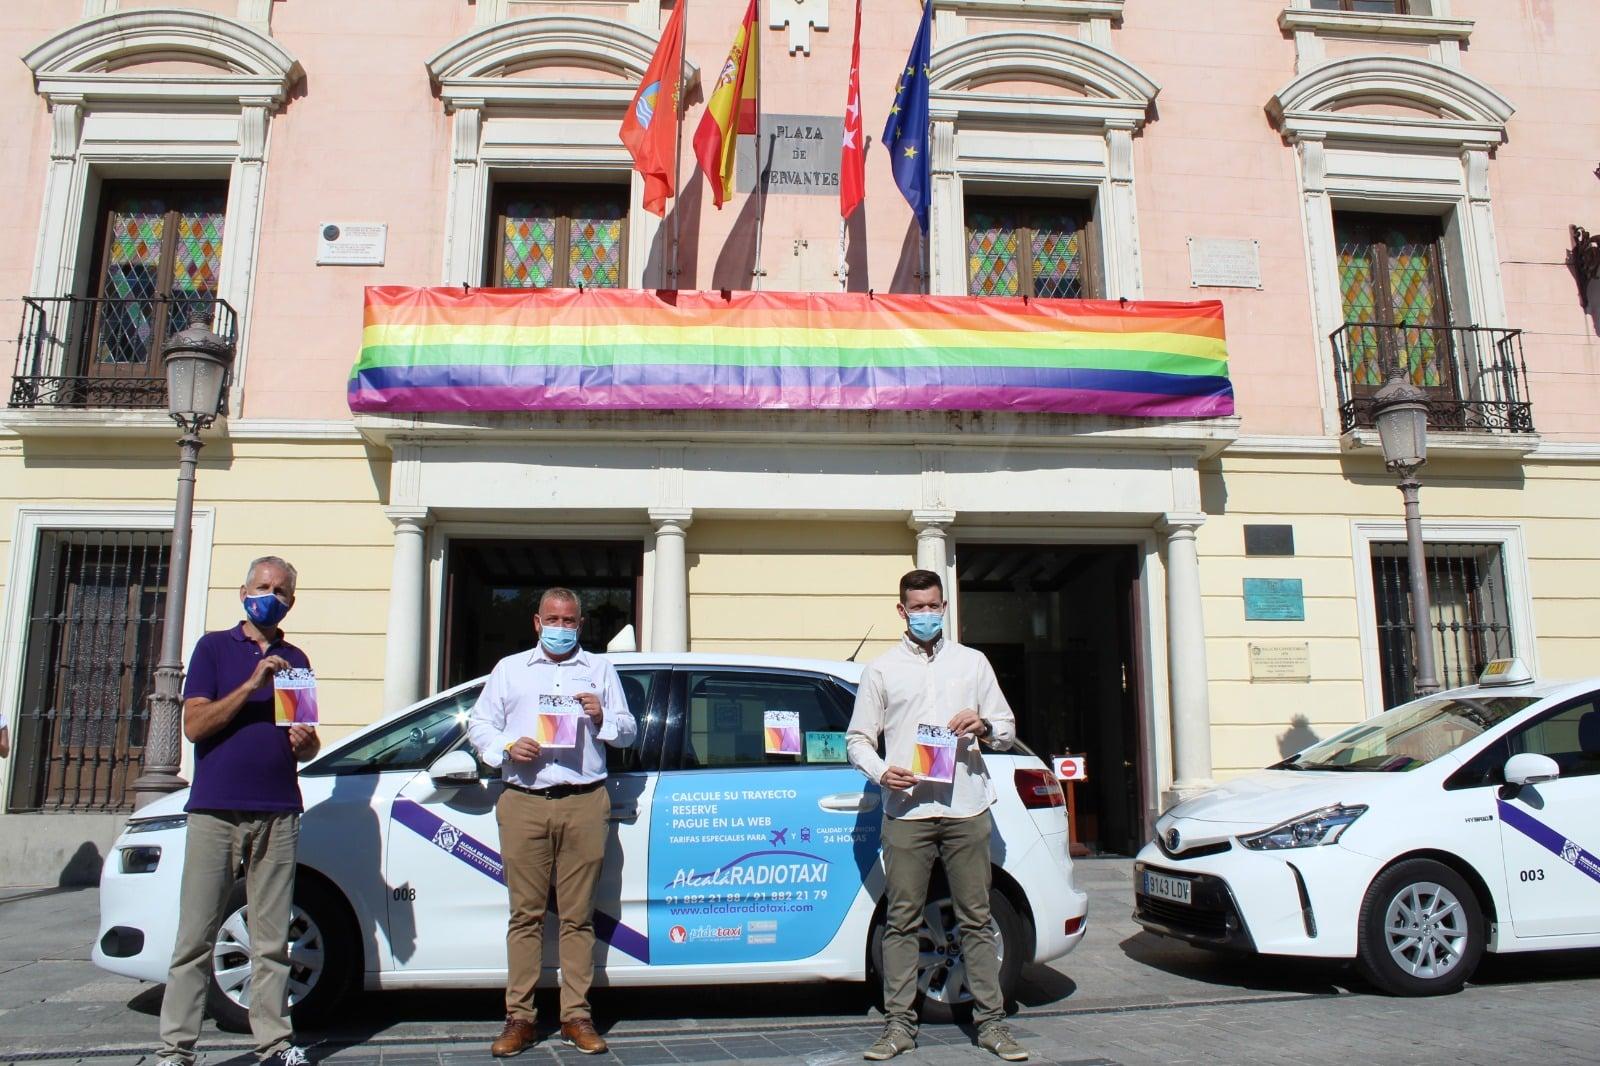 Taxis con banderas LGTBI